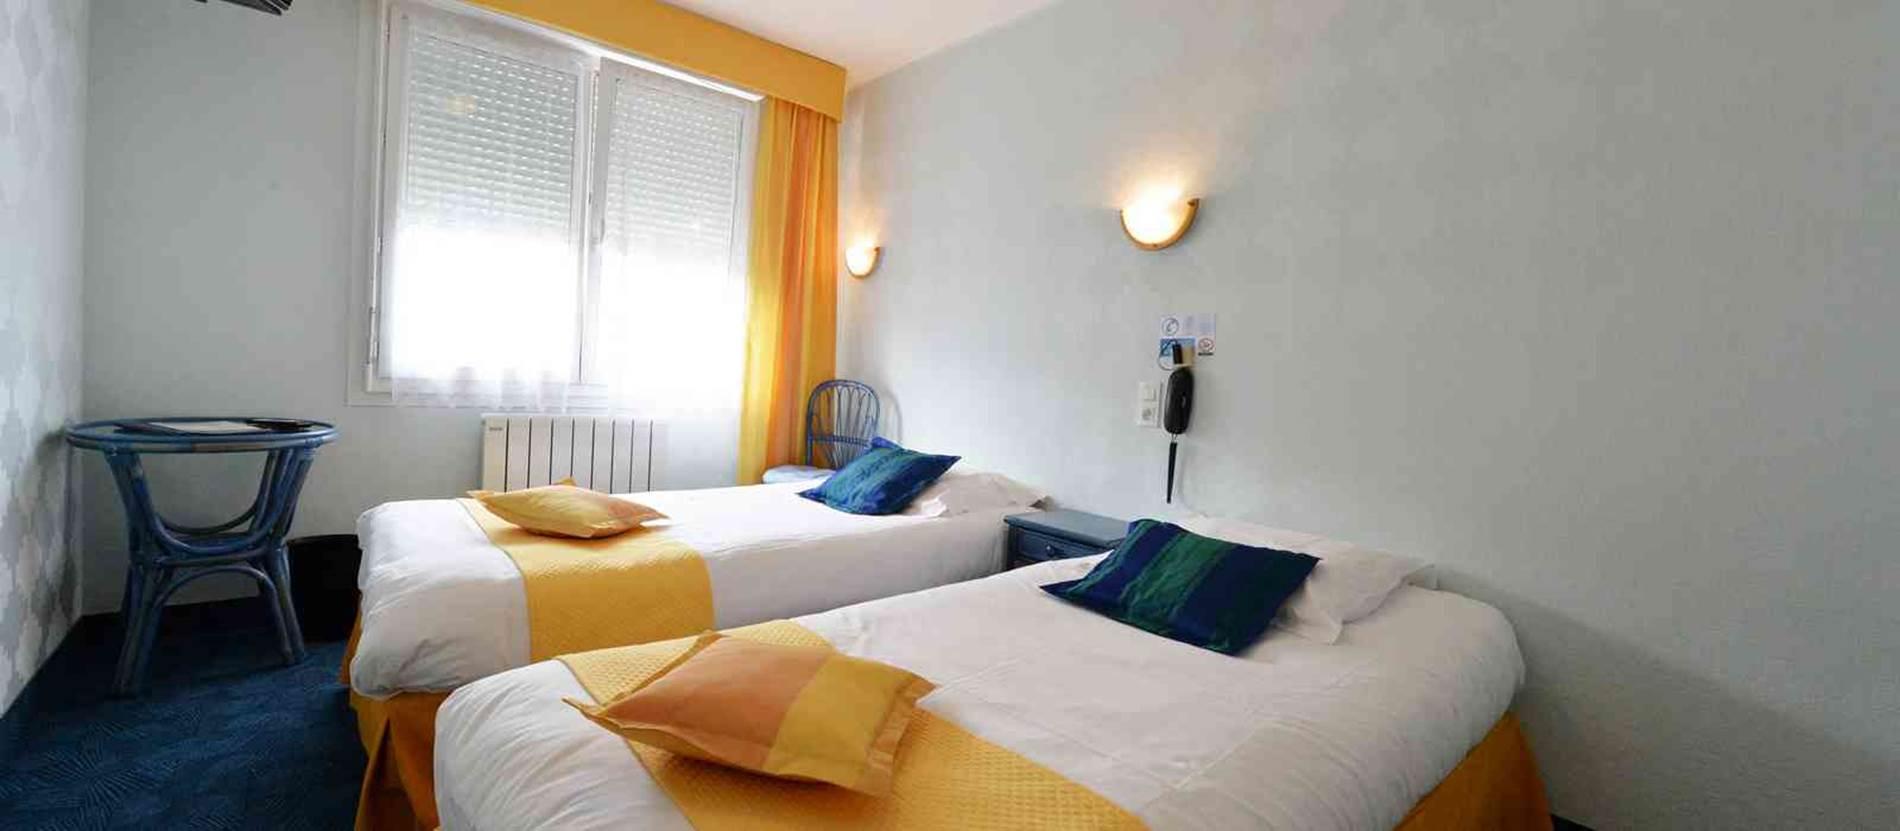 hotel-la-fontaine-theix-Morbihan-Bretagne-Sud-chambre © hotel-la-fontaine-theix